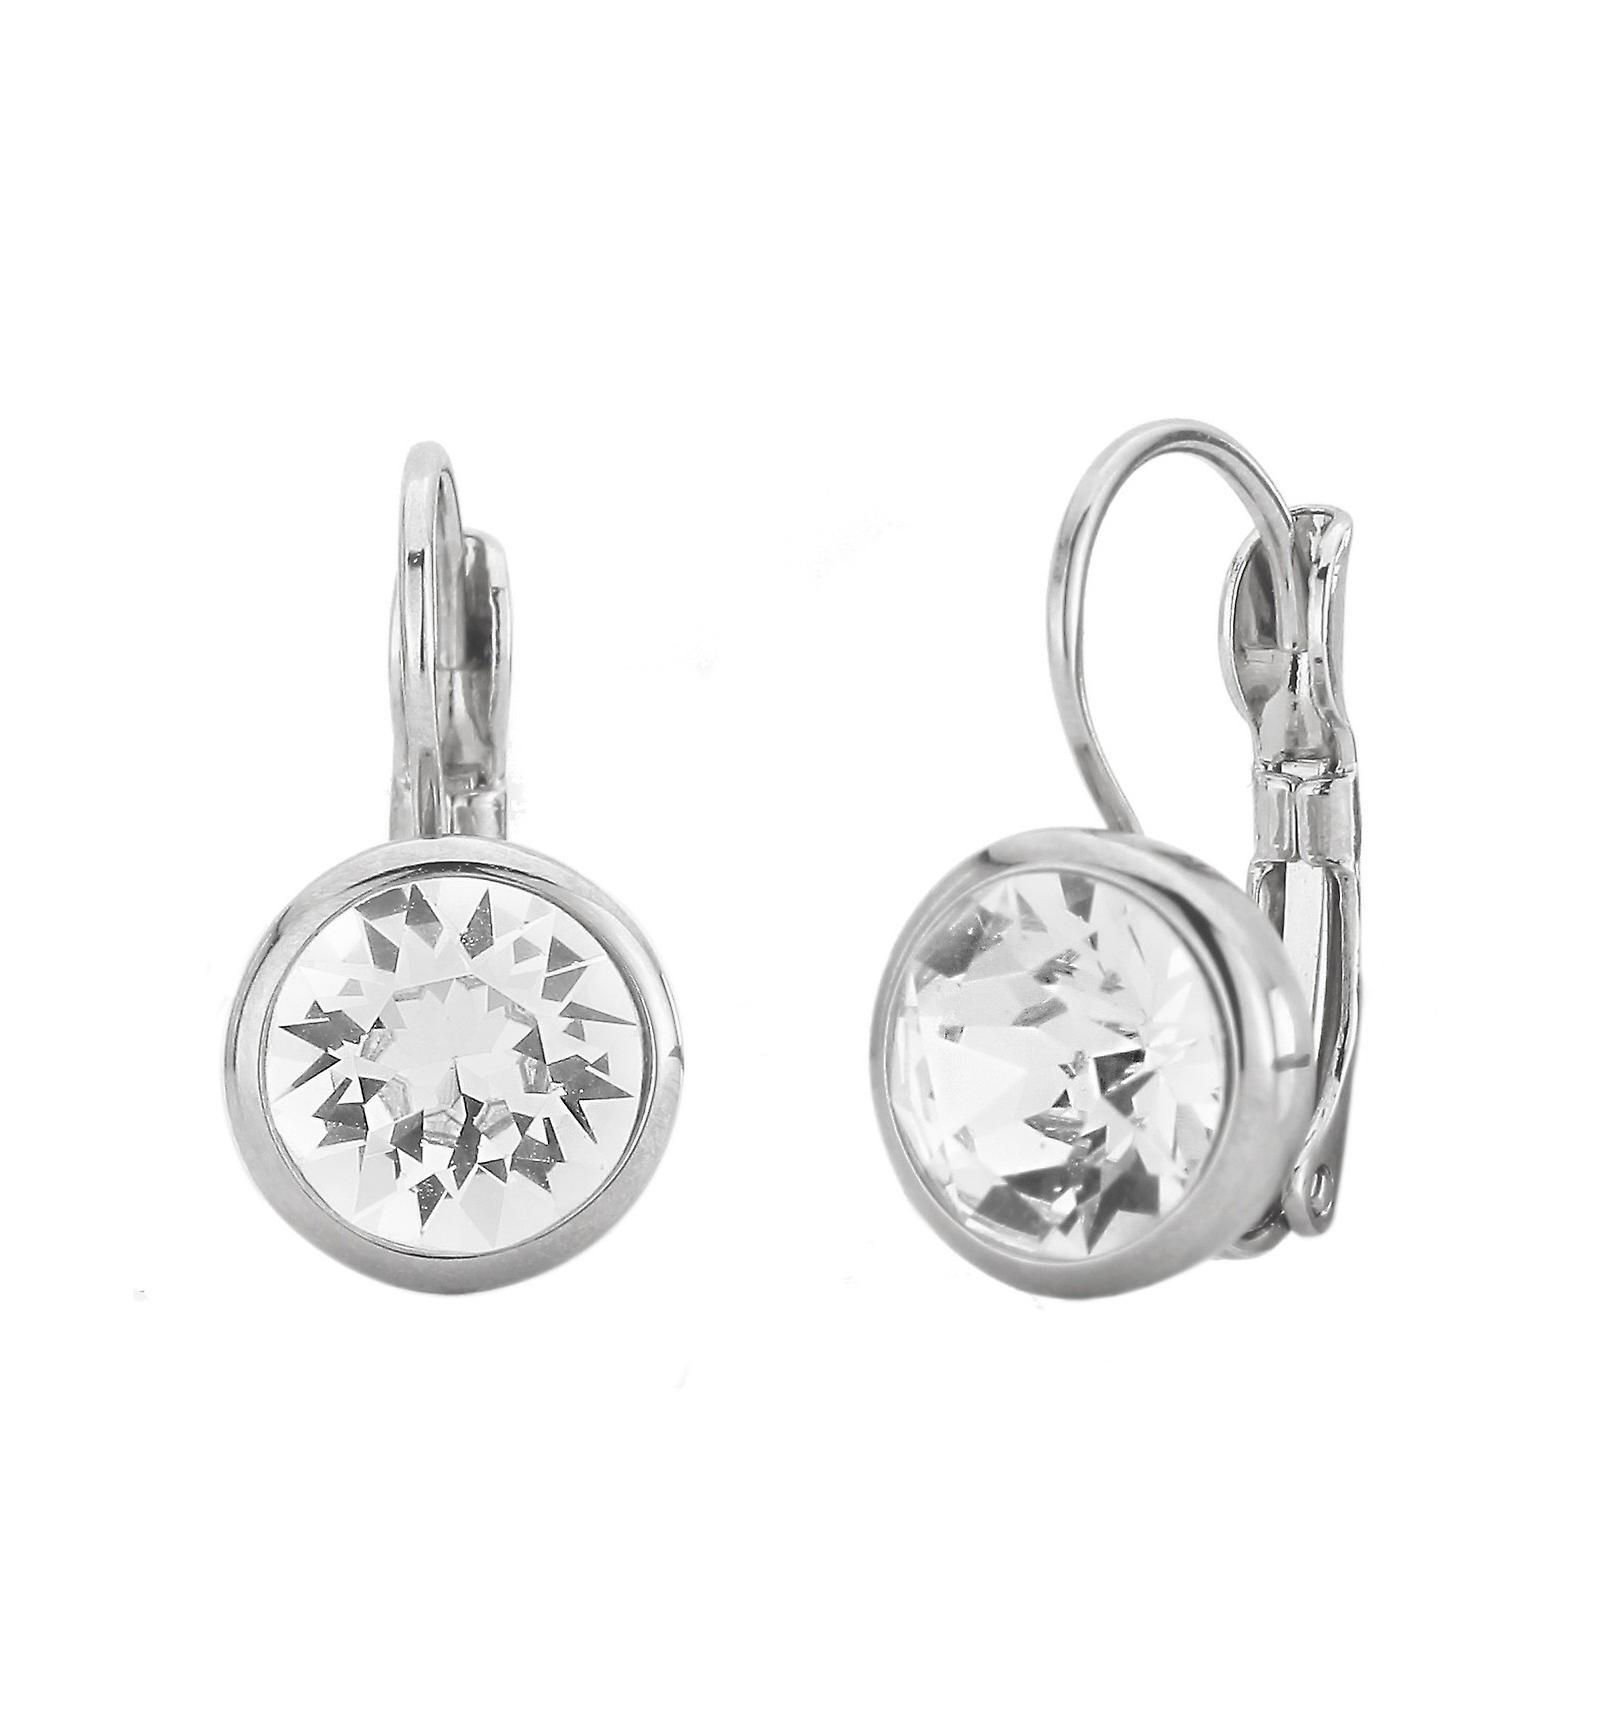 Traveller drop earring - Leverback - rhodium palted - 157043